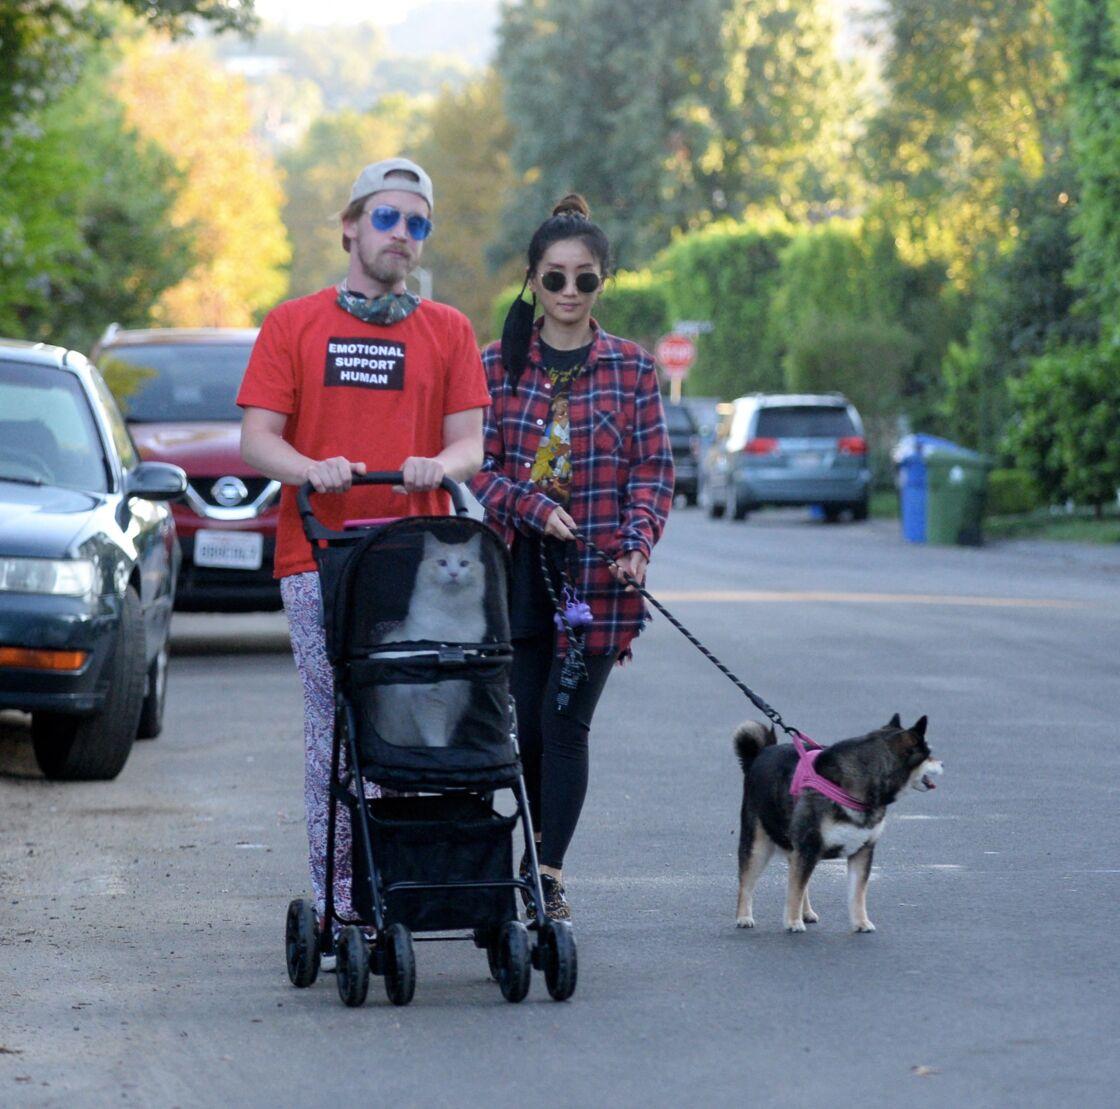 Macaulay Culkin et Brenda Song dans les rues de Los Angeles, en octobre 2020.